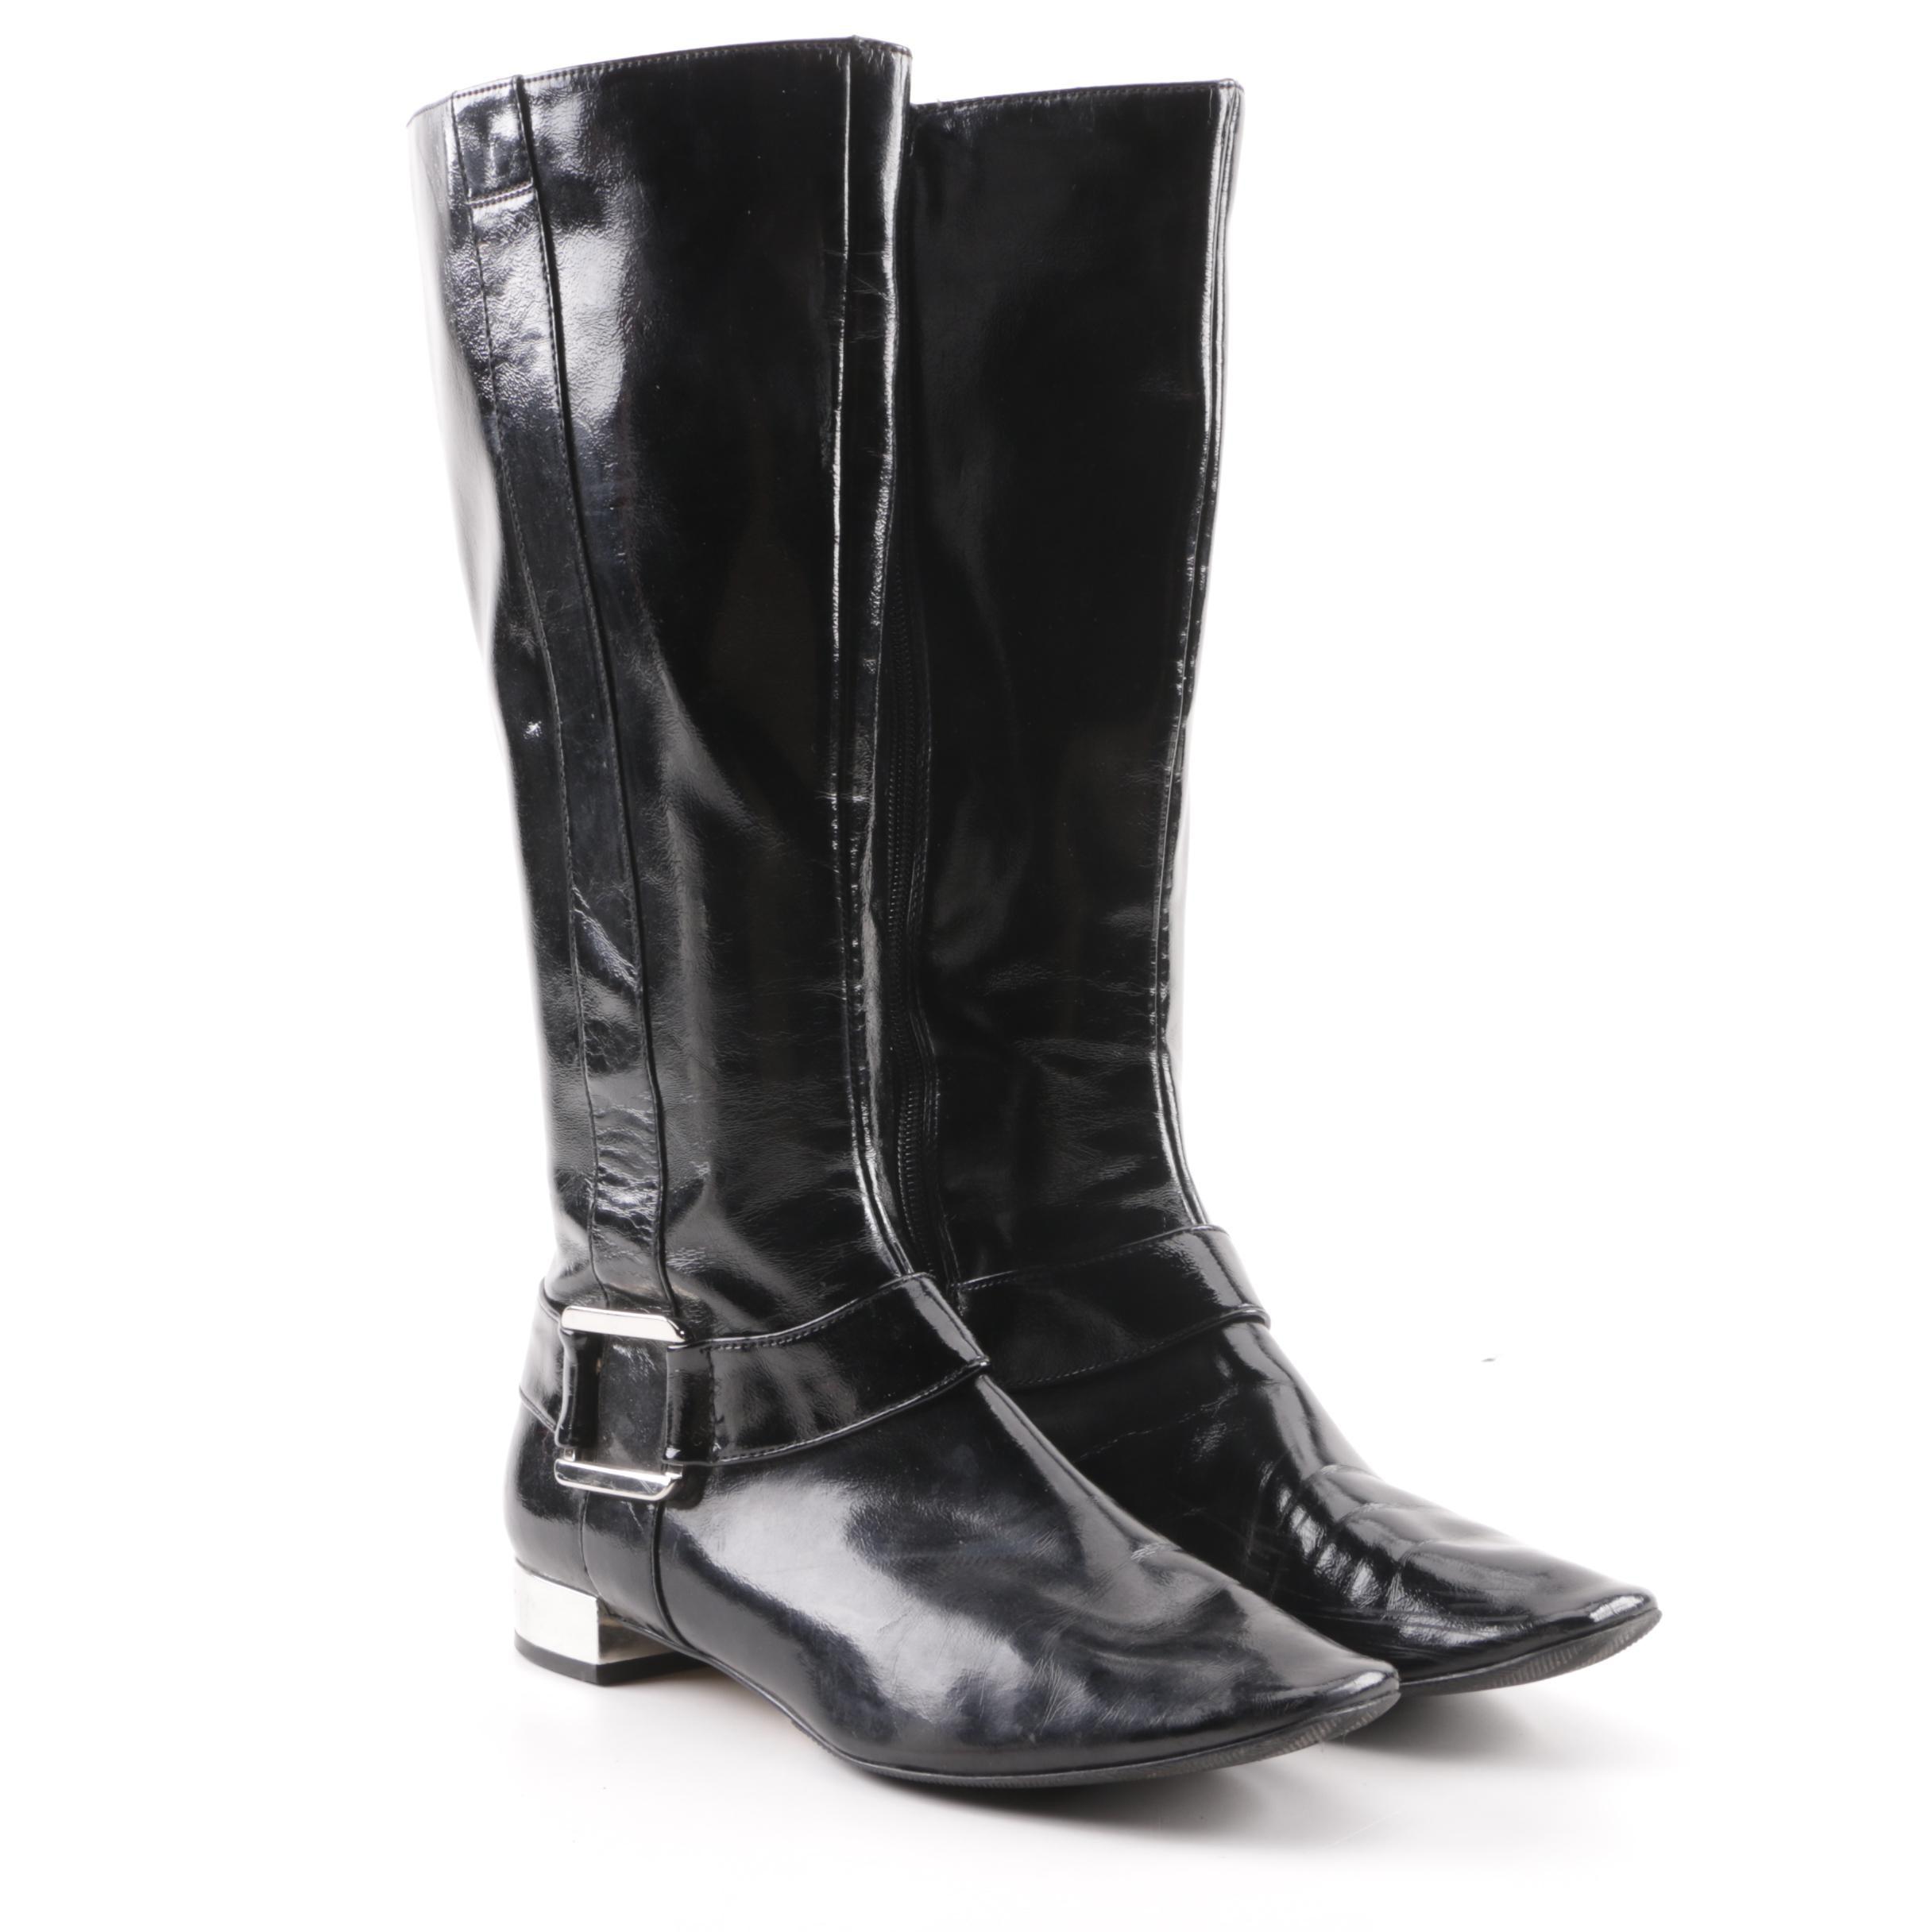 Women's Tahari Karl Black Riding Boots